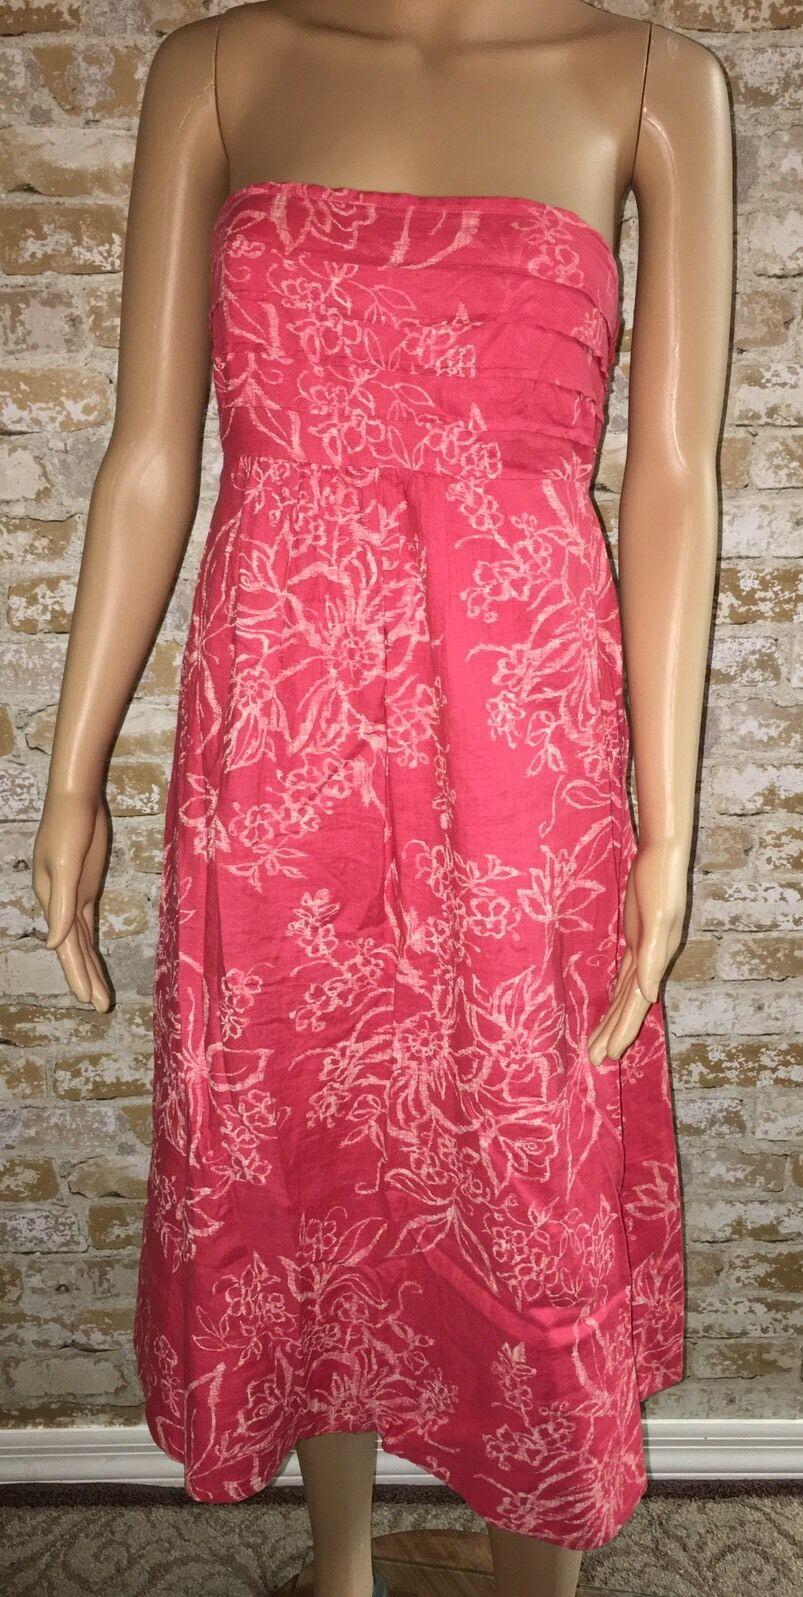 Banana Republic Size 2 Linen Sleeveless Lined Coral Dress